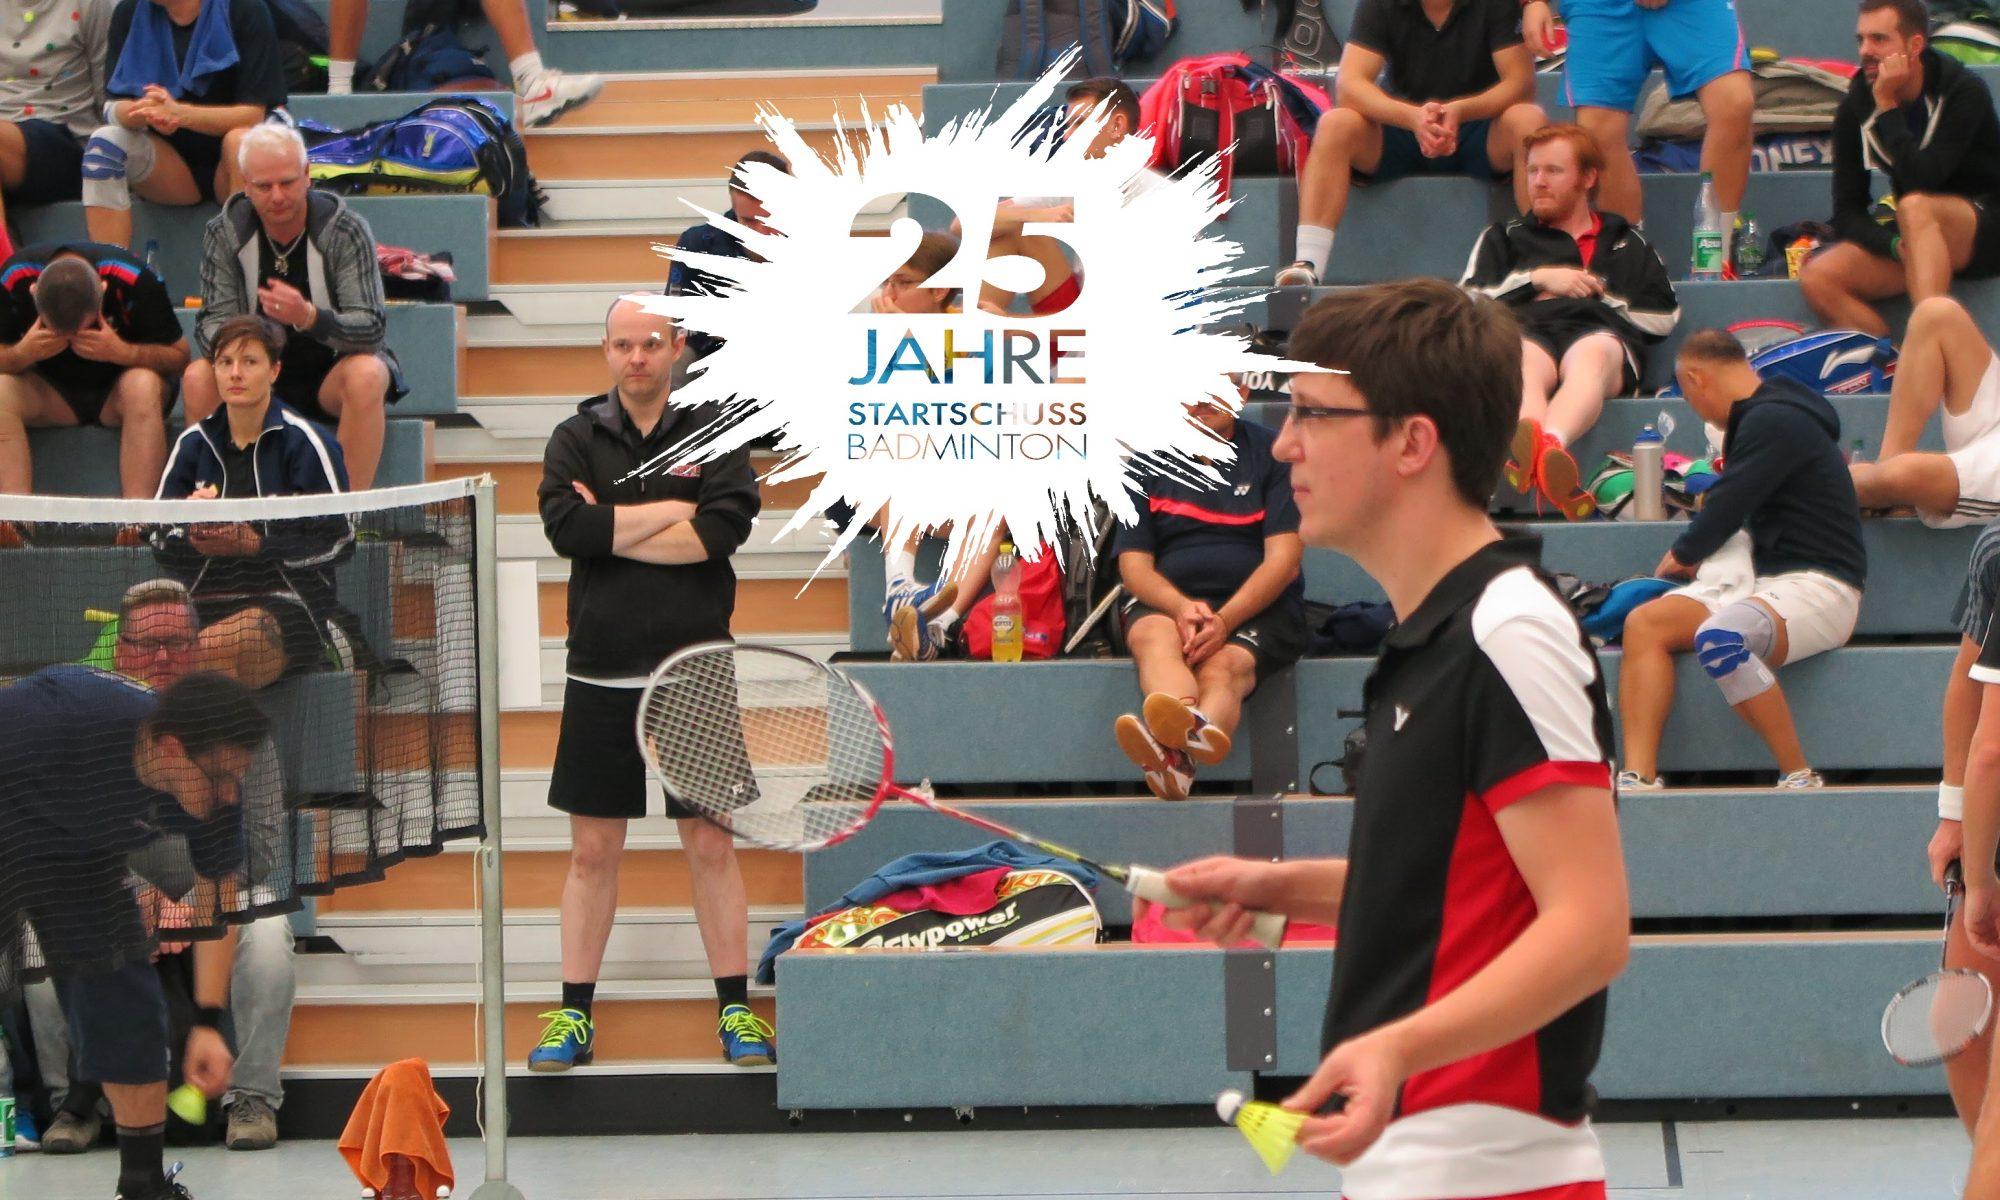 Startschuss-Badminton